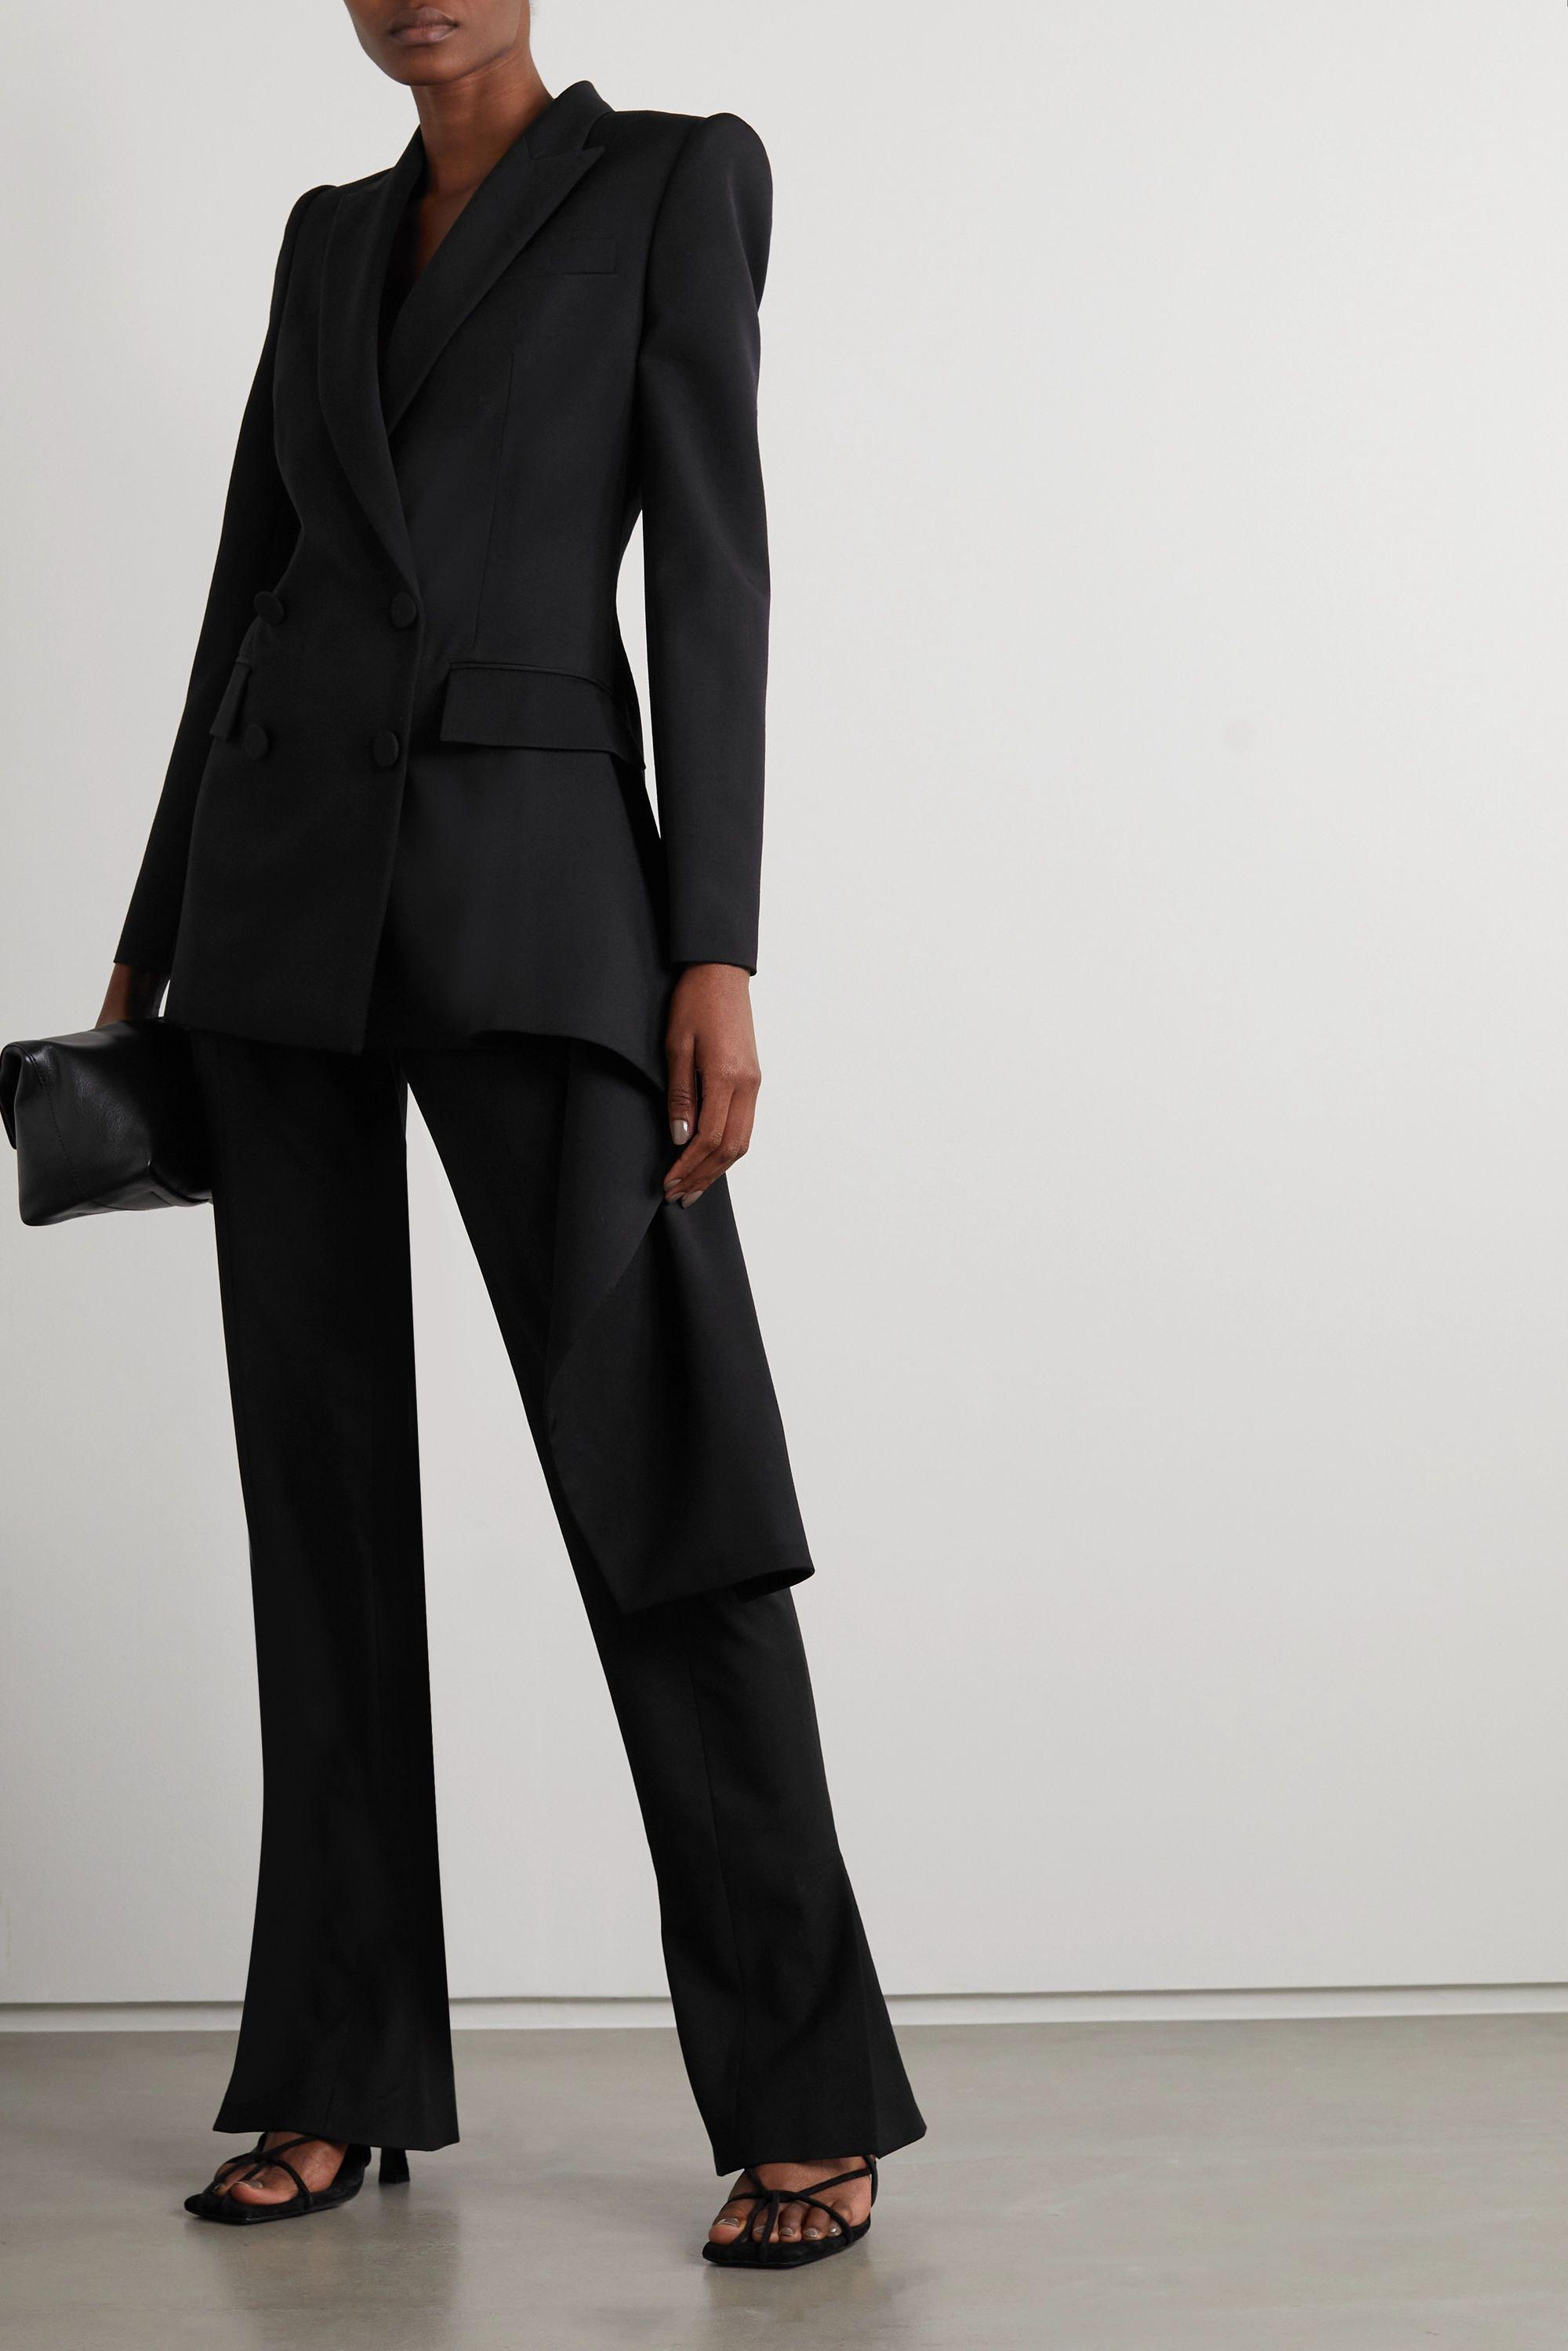 Alexander McQueen Asymmetric draped grain de poudre wool blazer